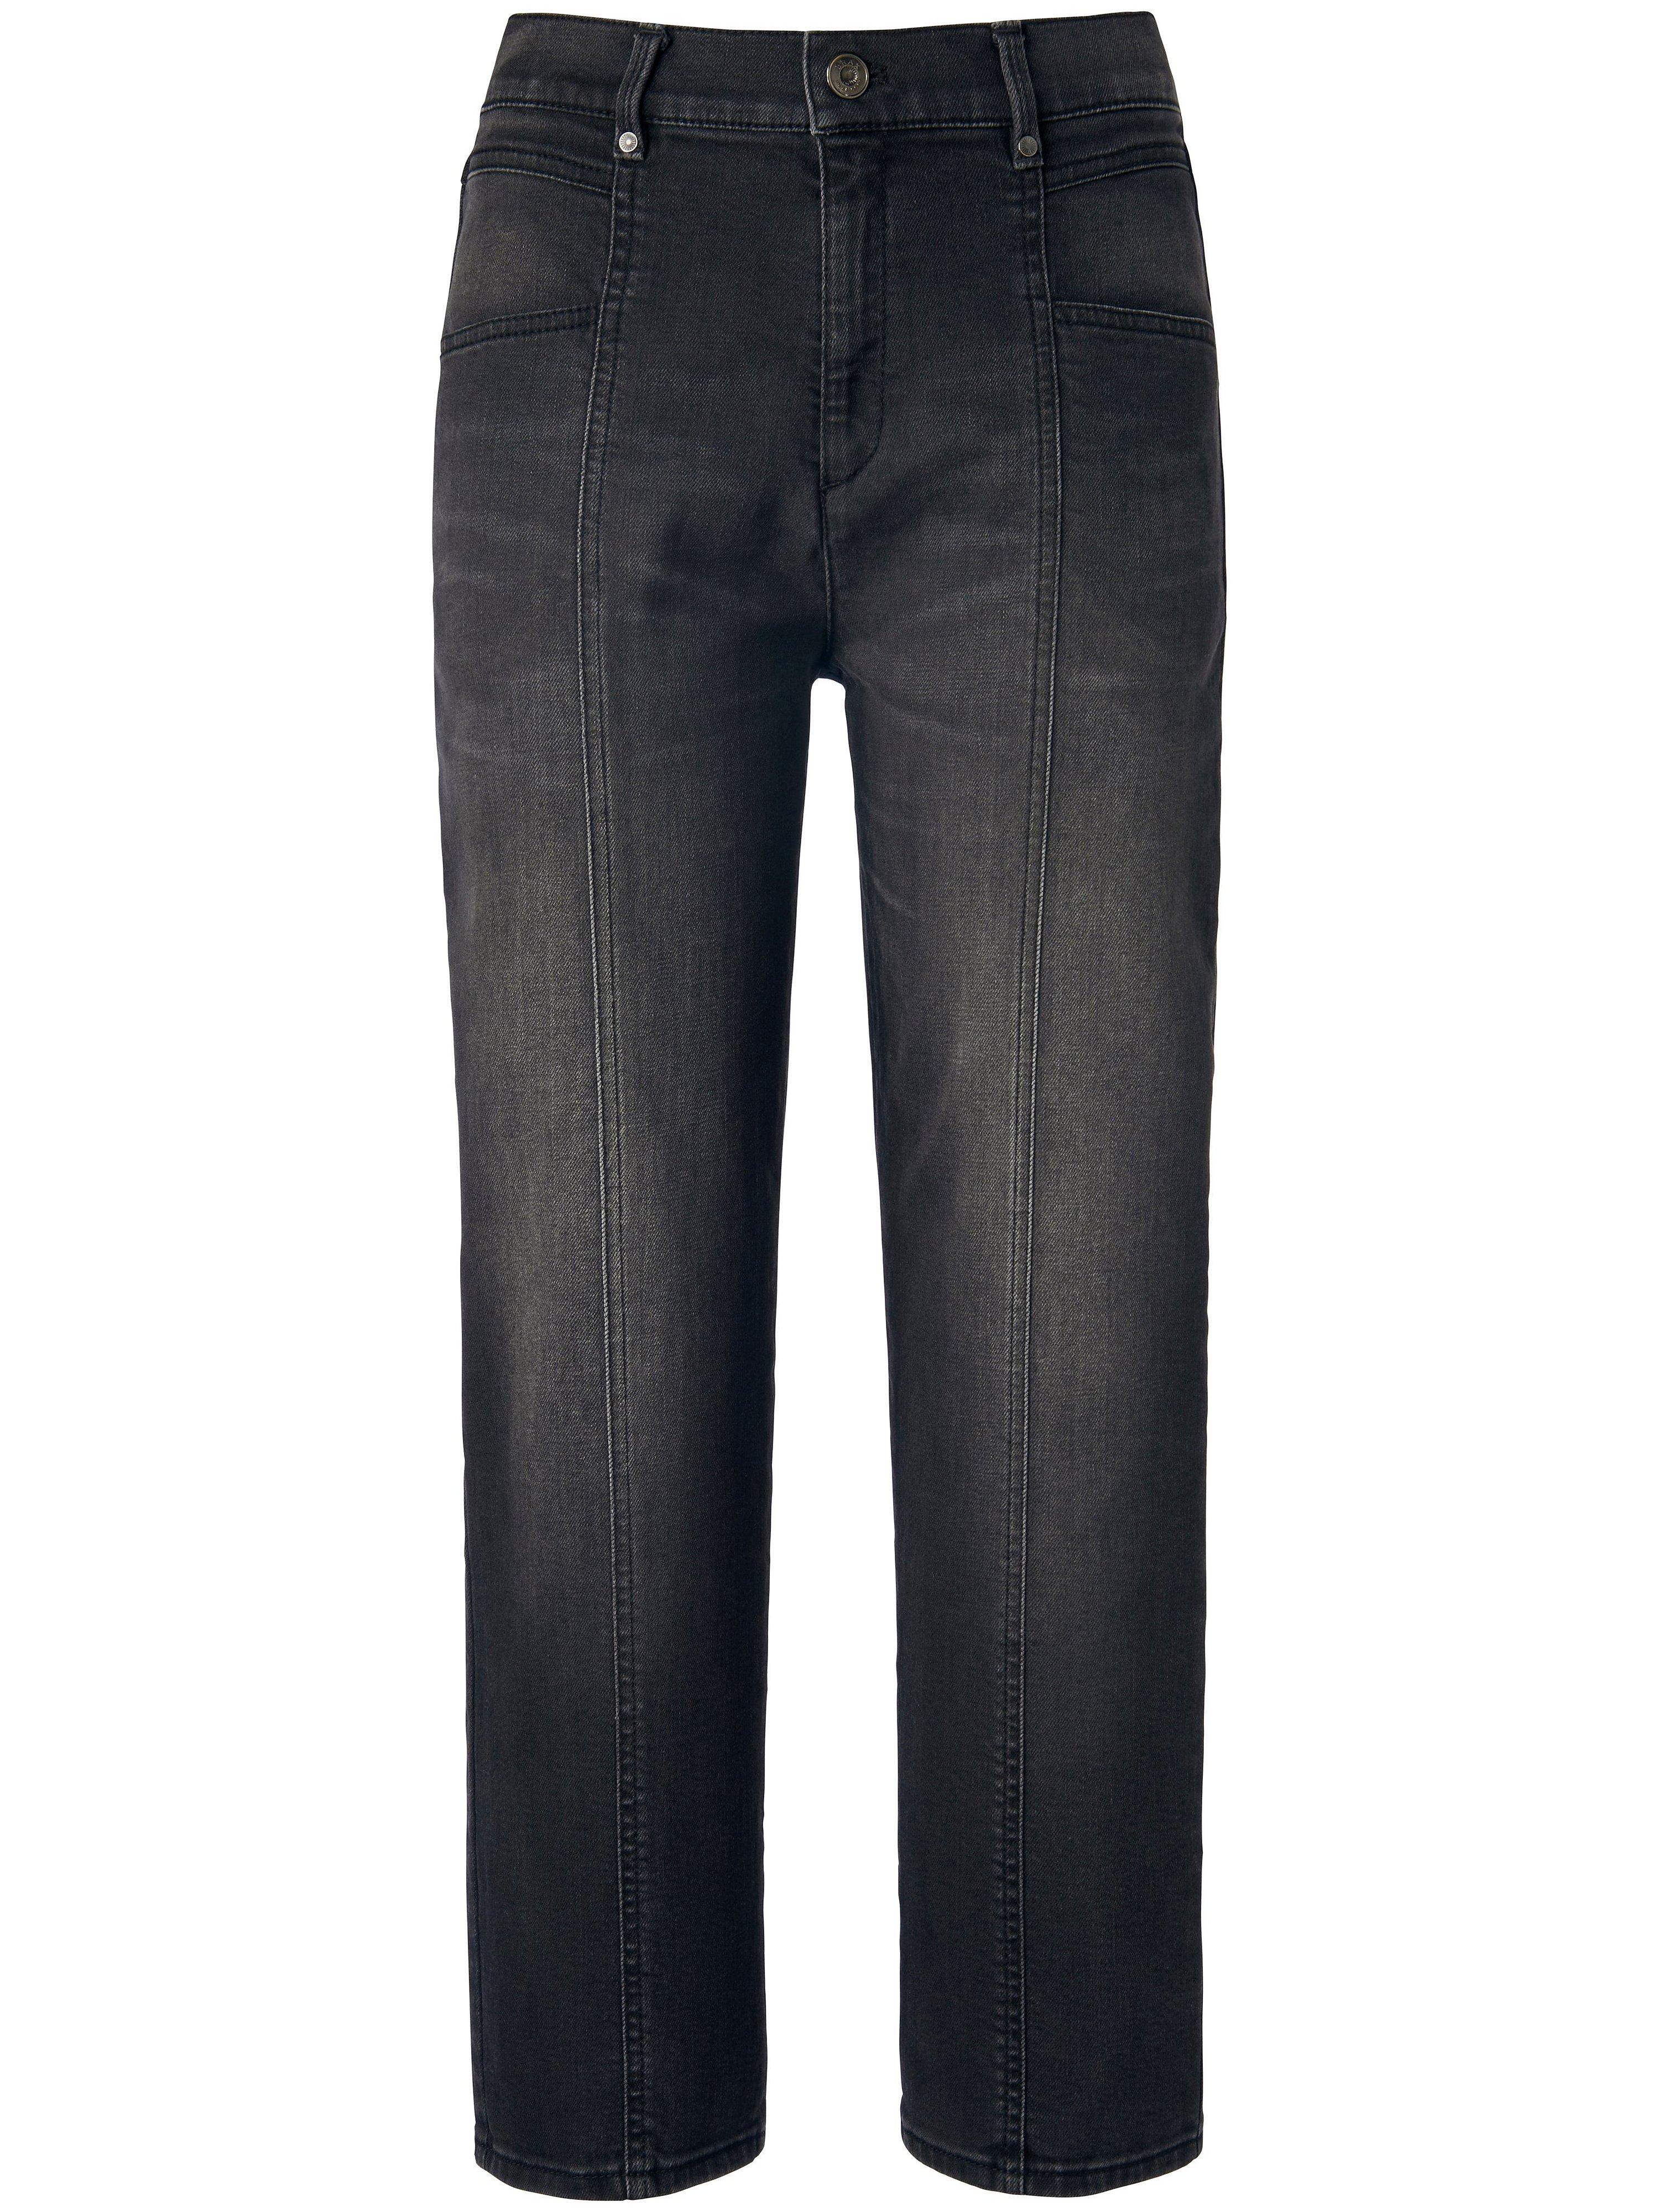 Straight Fit-7/8-jeans model Maple S Van Brax Feel Good denim